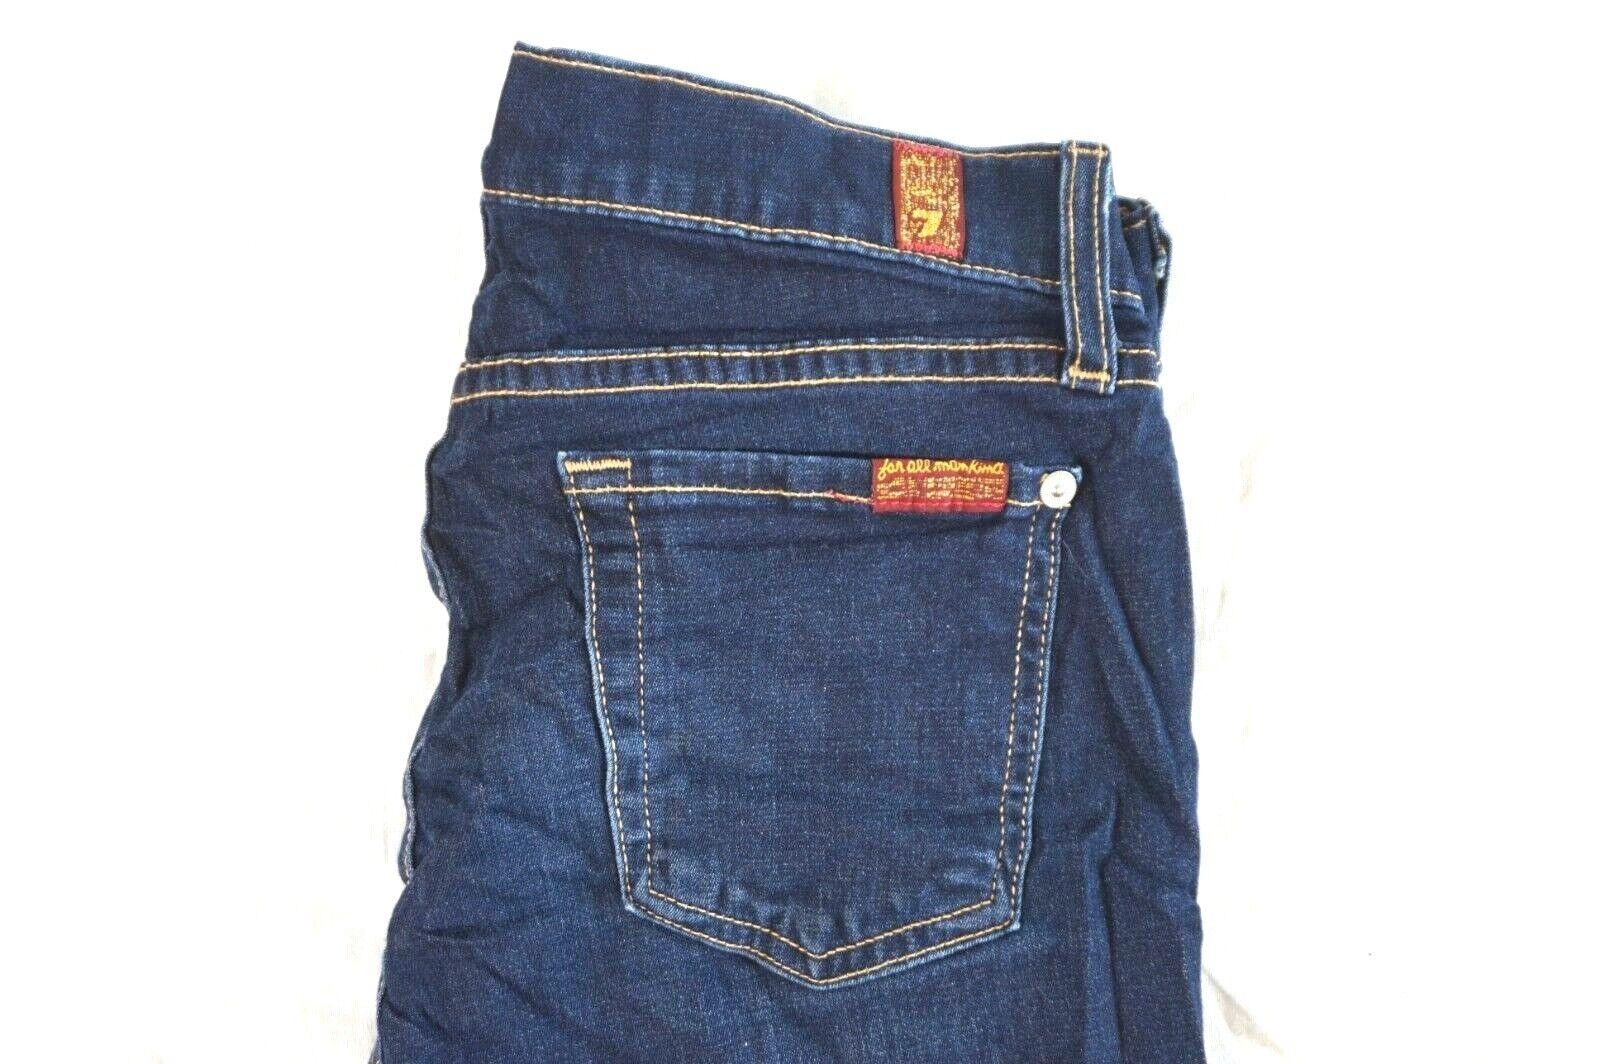 7 FOR ALL MANKIND Women's Dark Wash Skinny Denim Jeans 24 x 27 EUC